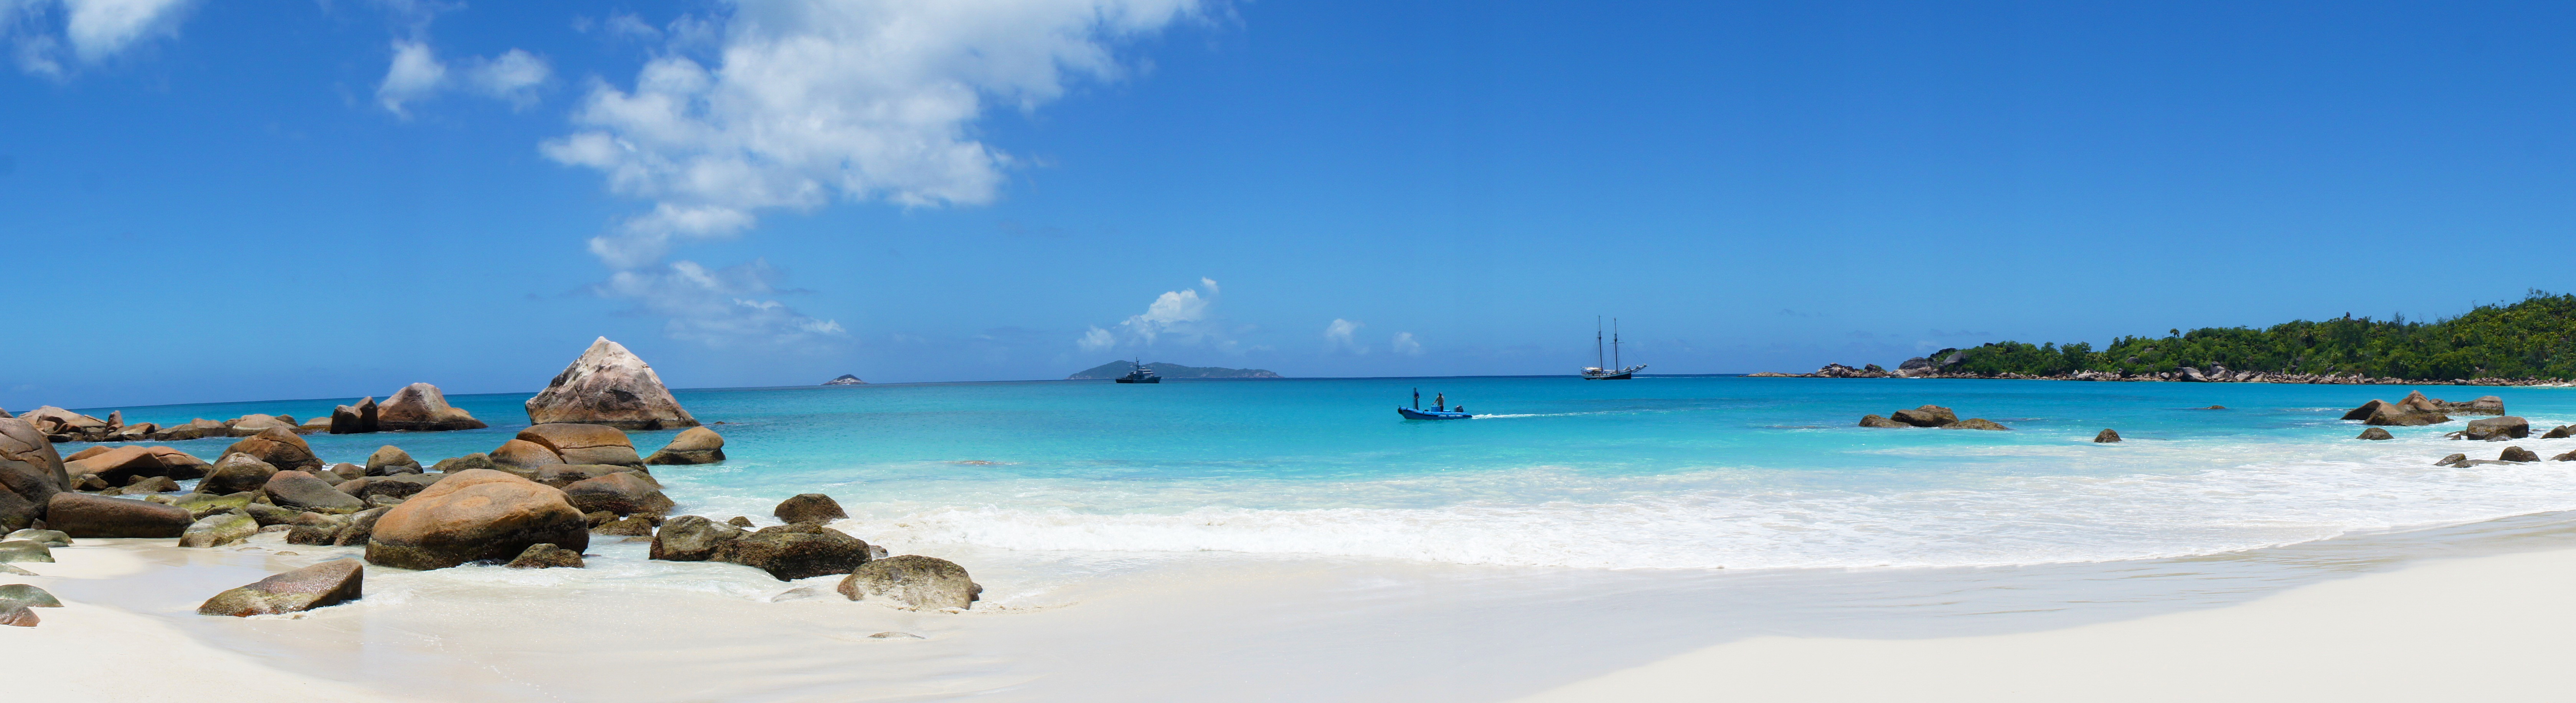 Seychelle-szigetek, Mahe-sziget